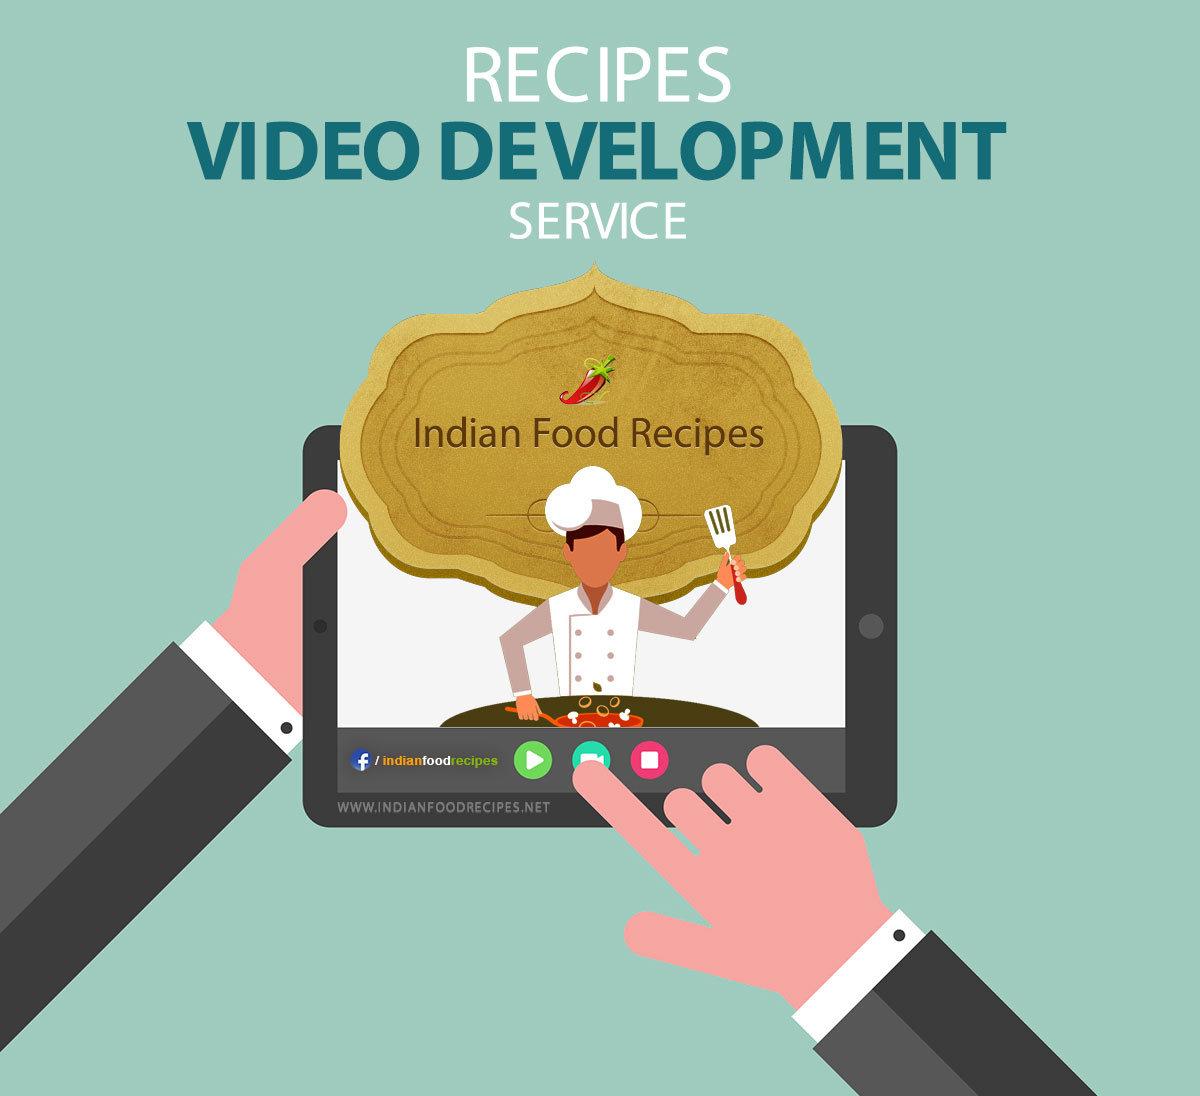 Recipe Video Development Service